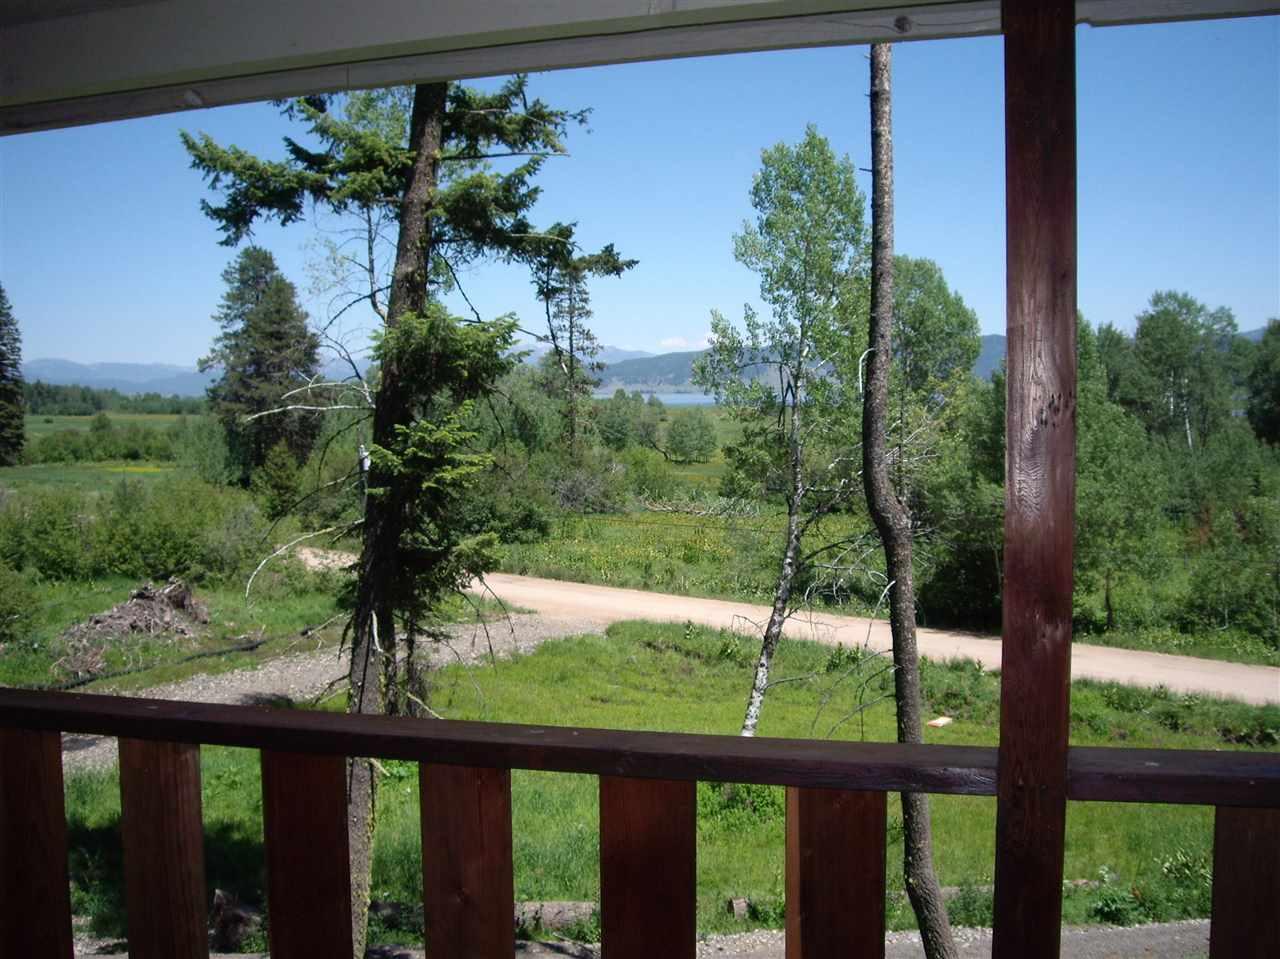 1598 Bear Trail Loop,Cascade,Idaho 83611,3 Bedrooms Bedrooms,1 BathroomBathrooms,Rental,1598 Bear Trail Loop,98690453